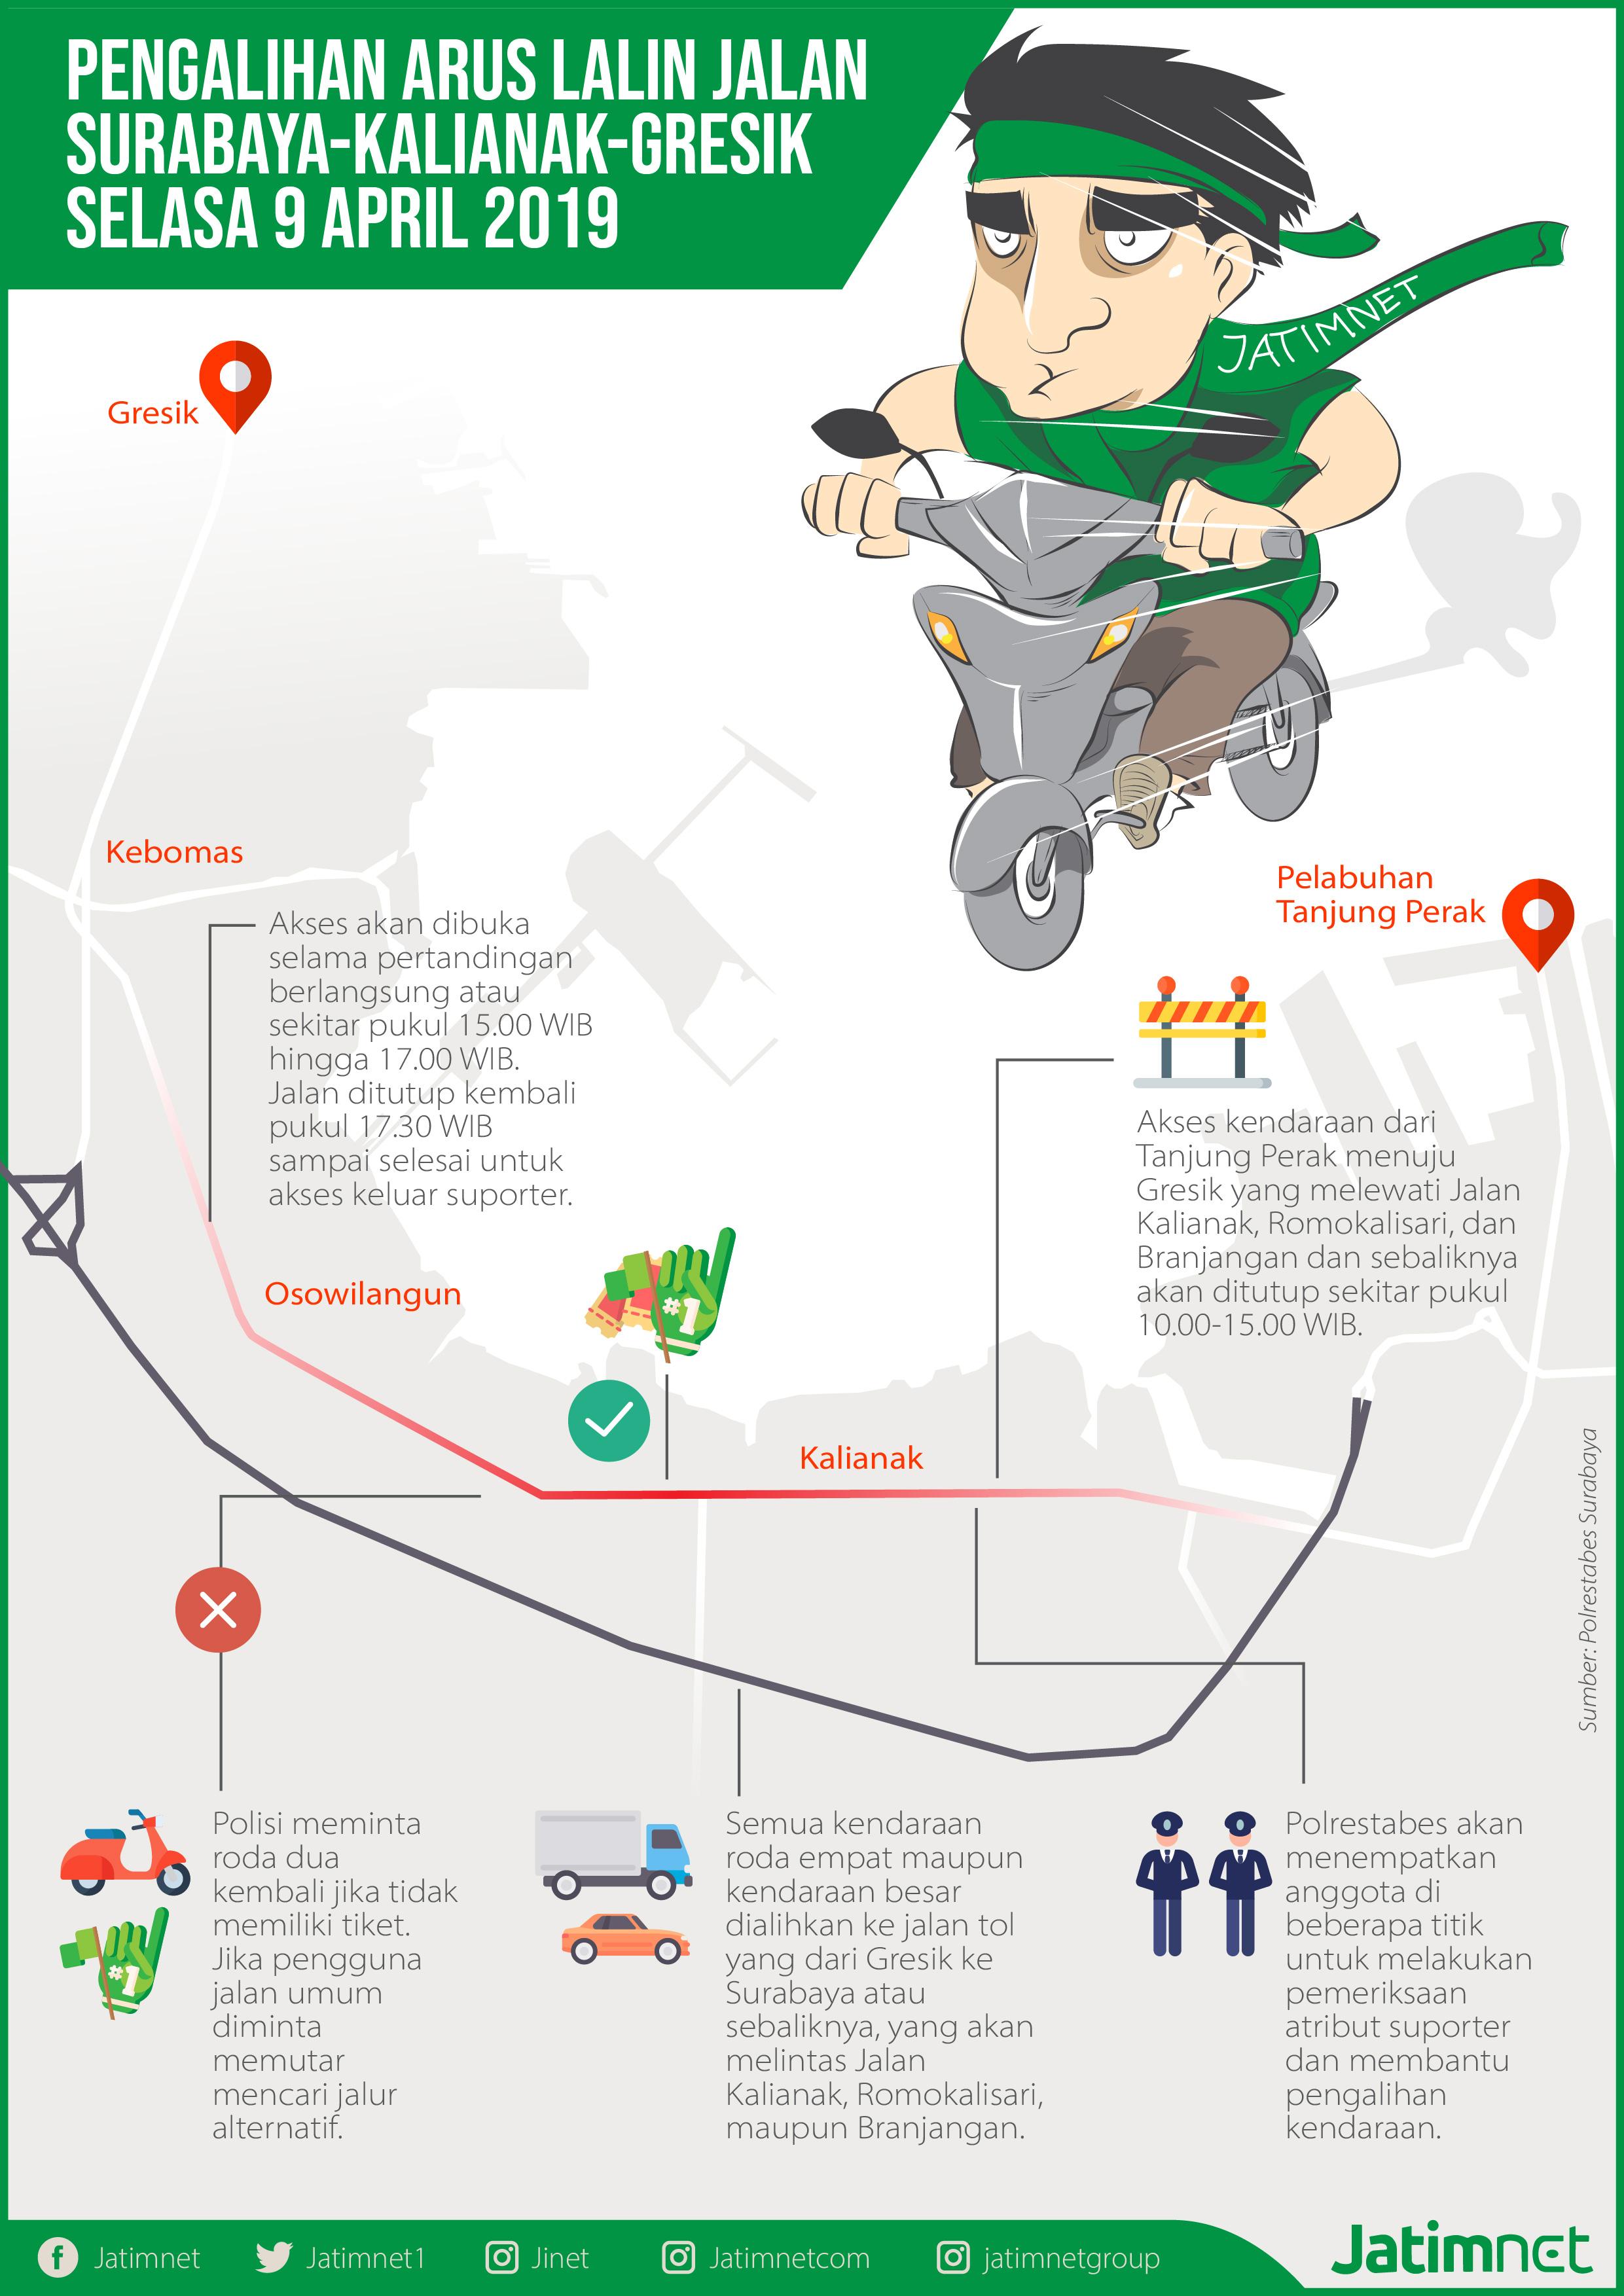 Polrestabes Surabaya Alihkan Jalur Tanjung Perak-Gresik